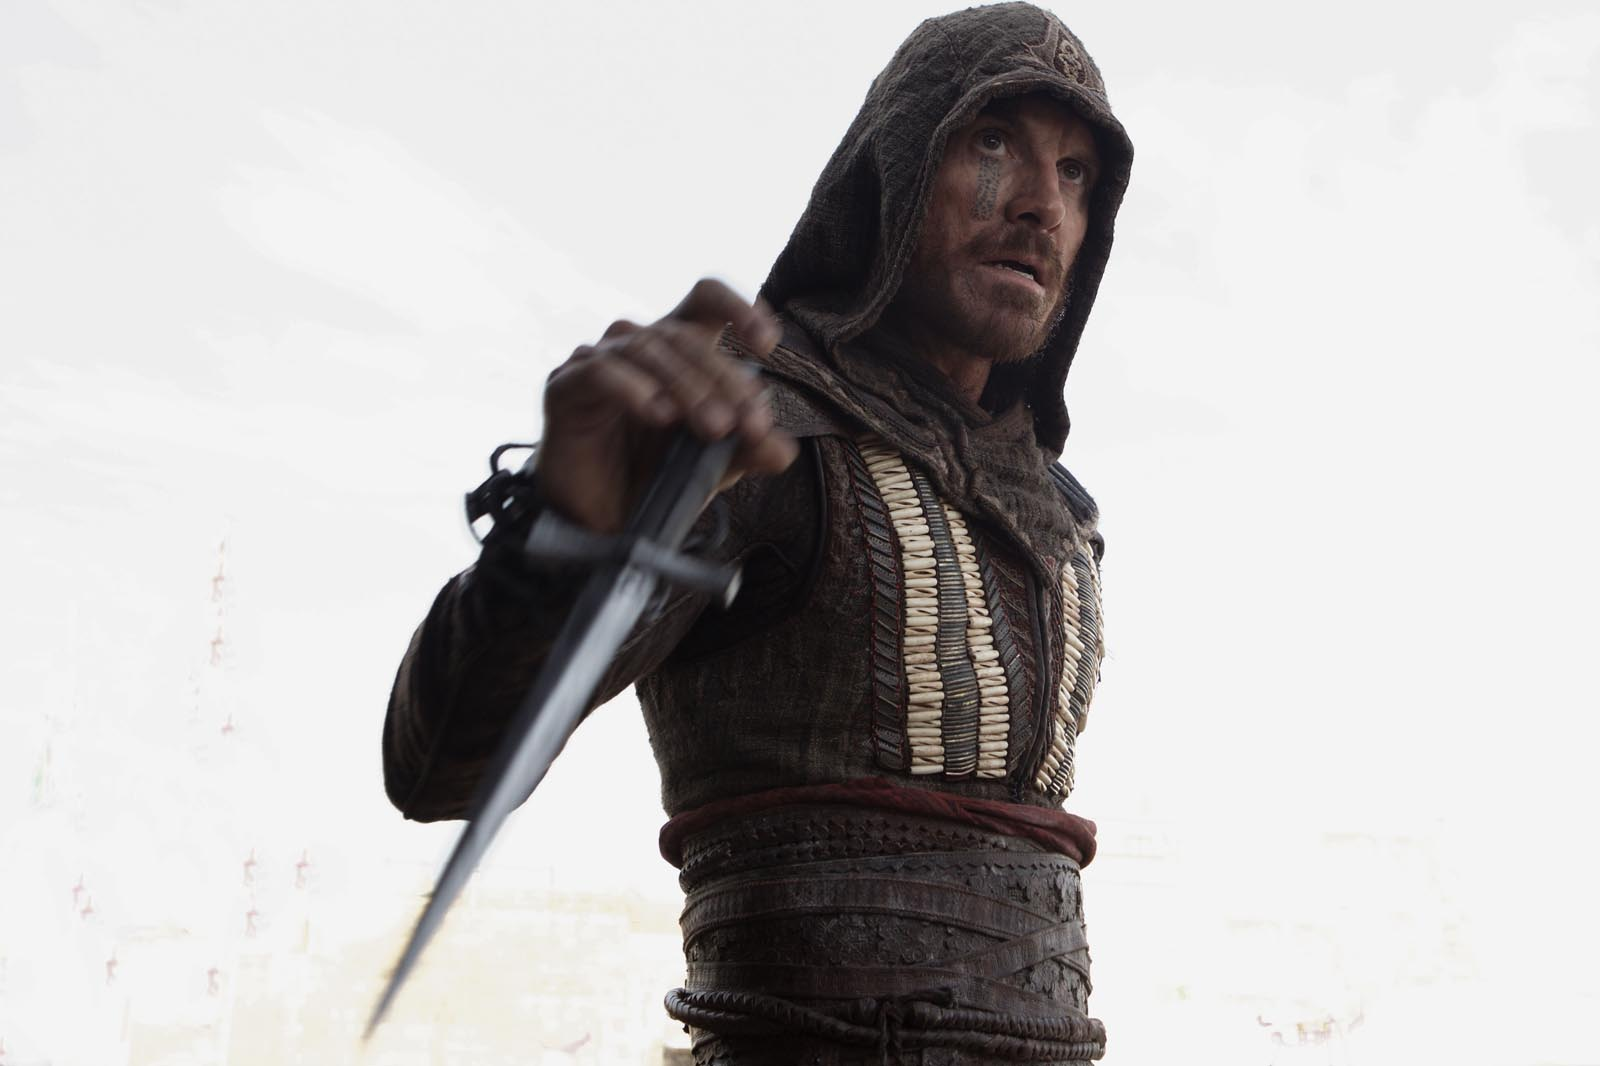 Assassin's Creed : catastrophe en vue ? - Dossier Film ... Michael Fassbender Facebook